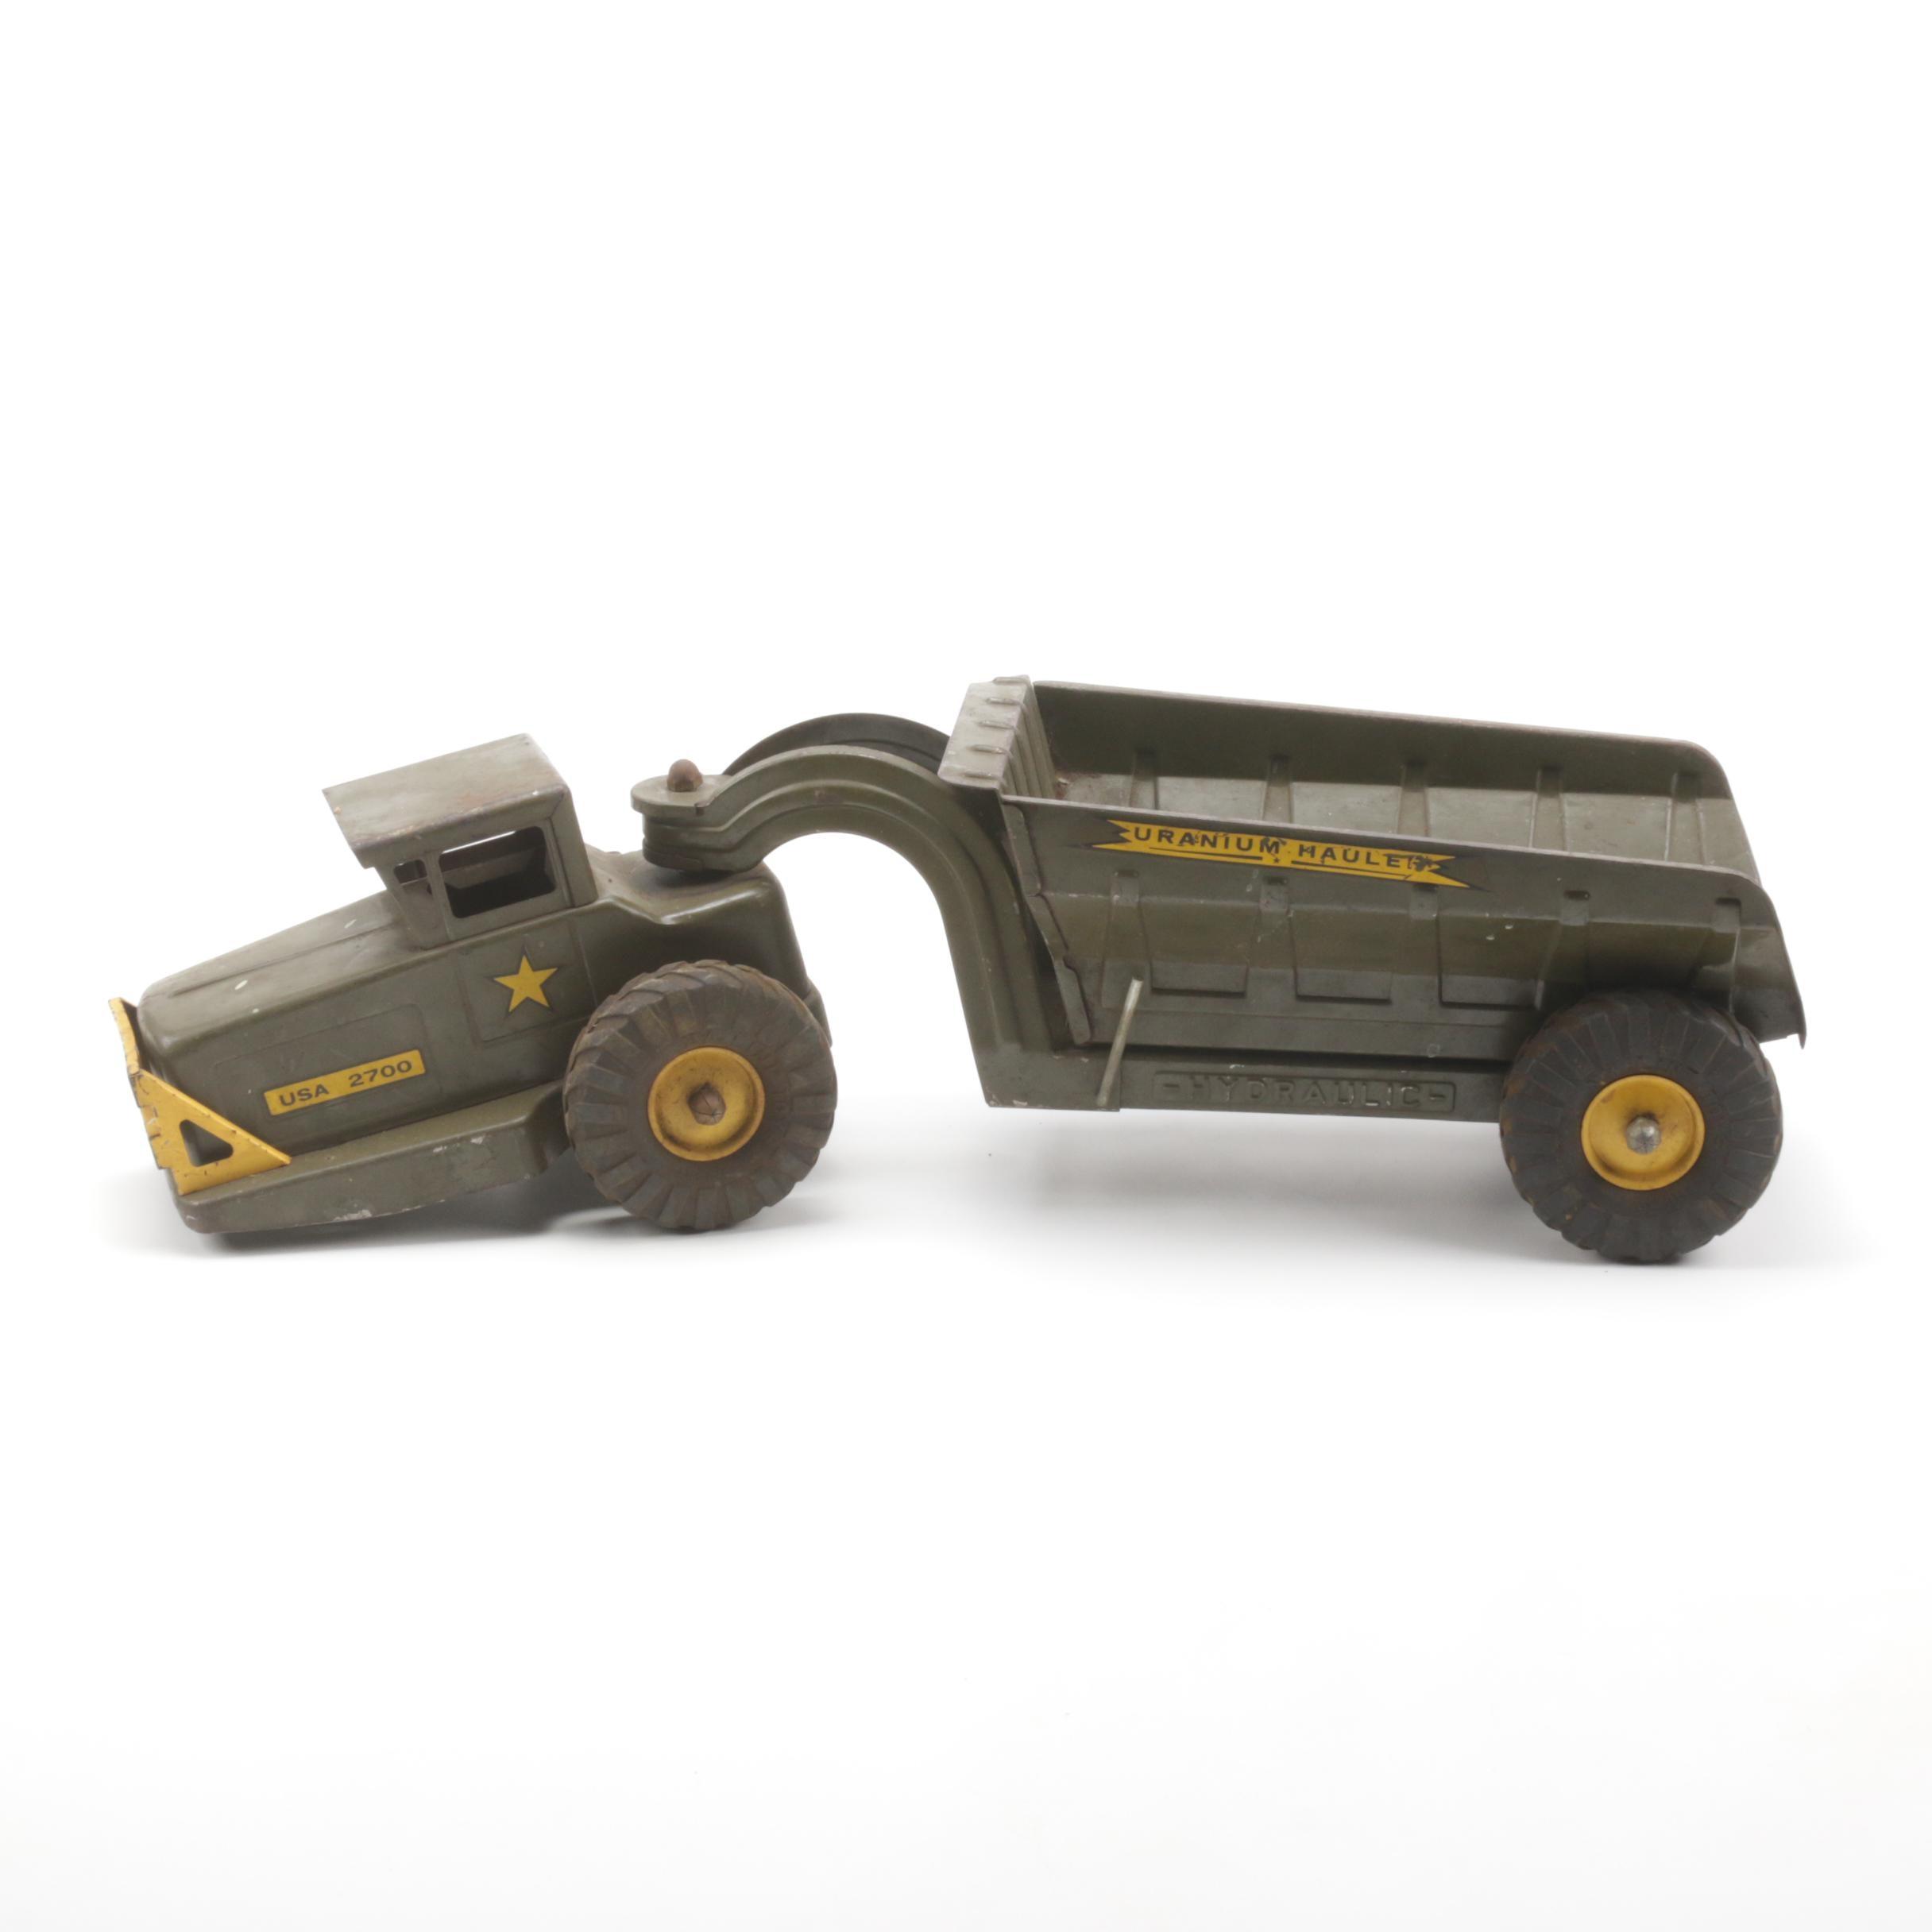 Nylint 1958 Uranium Hauler Military Toy Truck